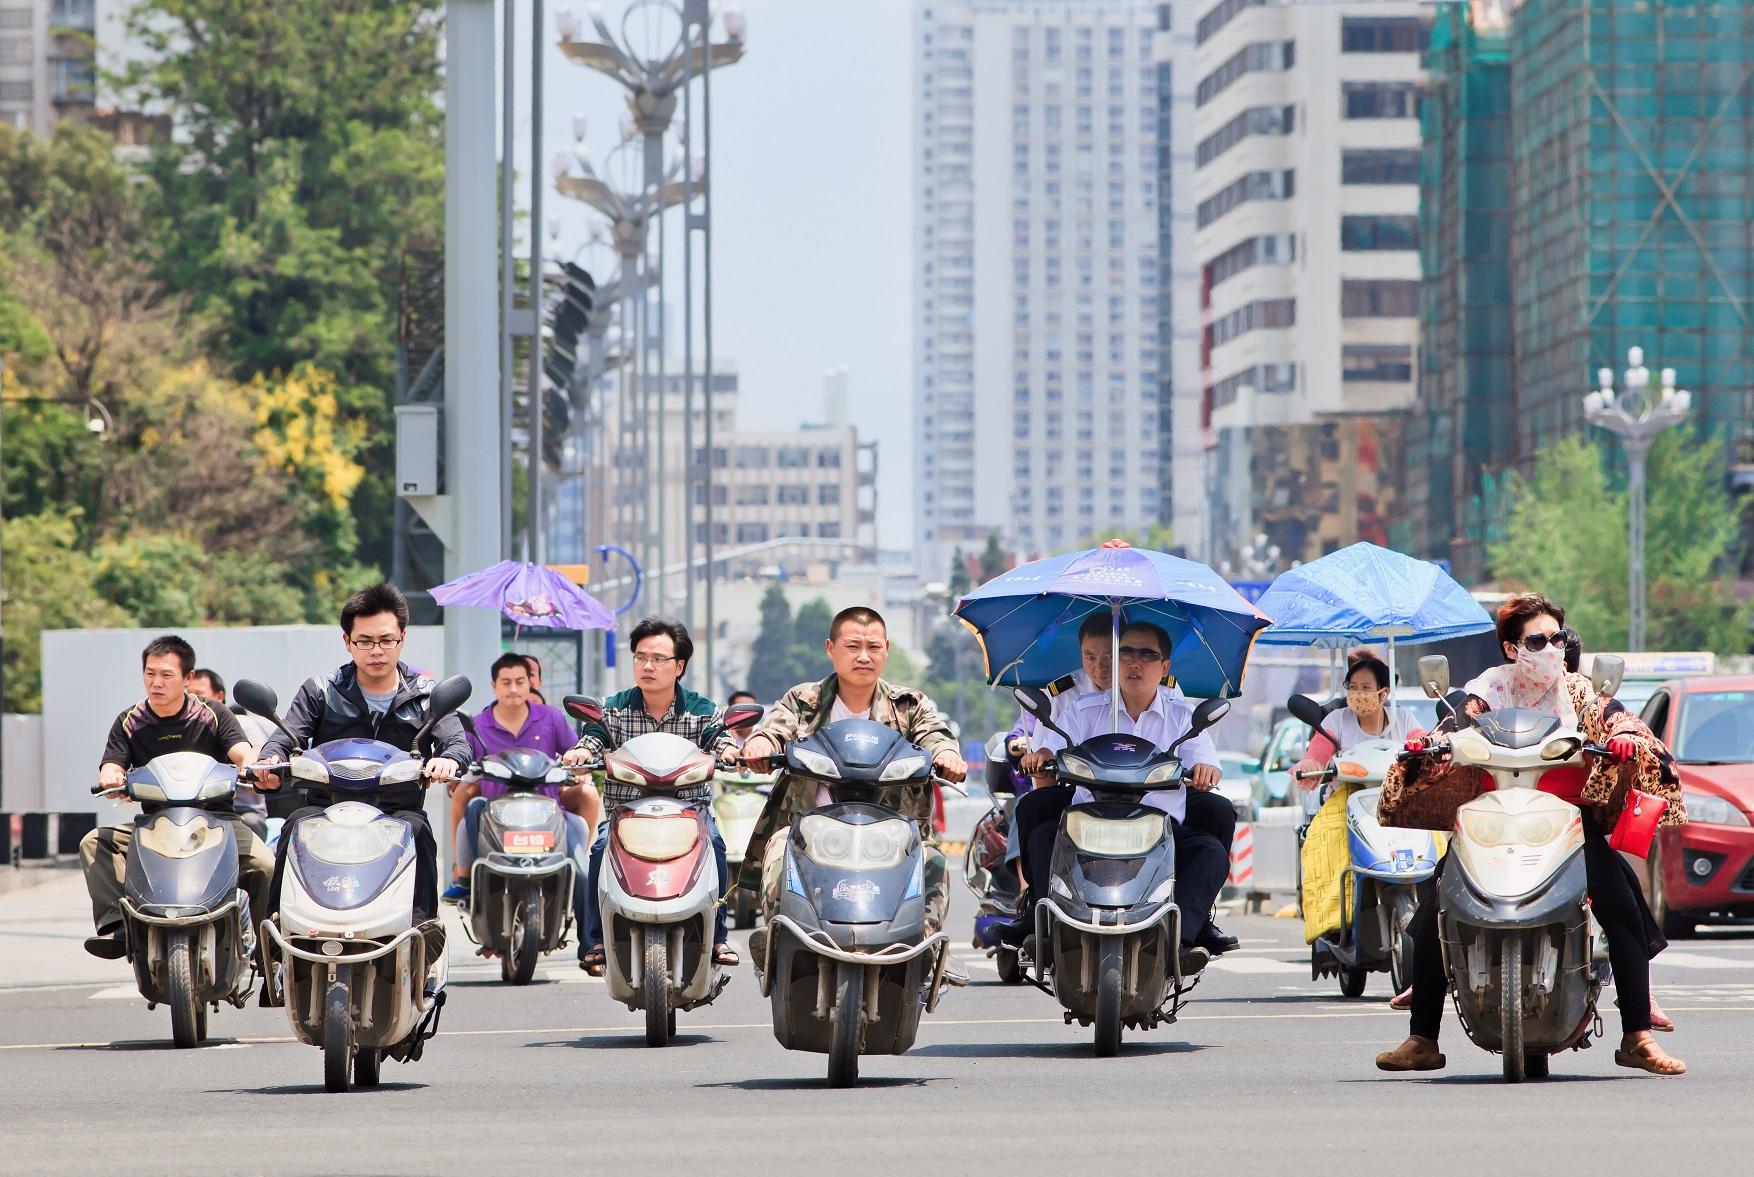 scooters op straat